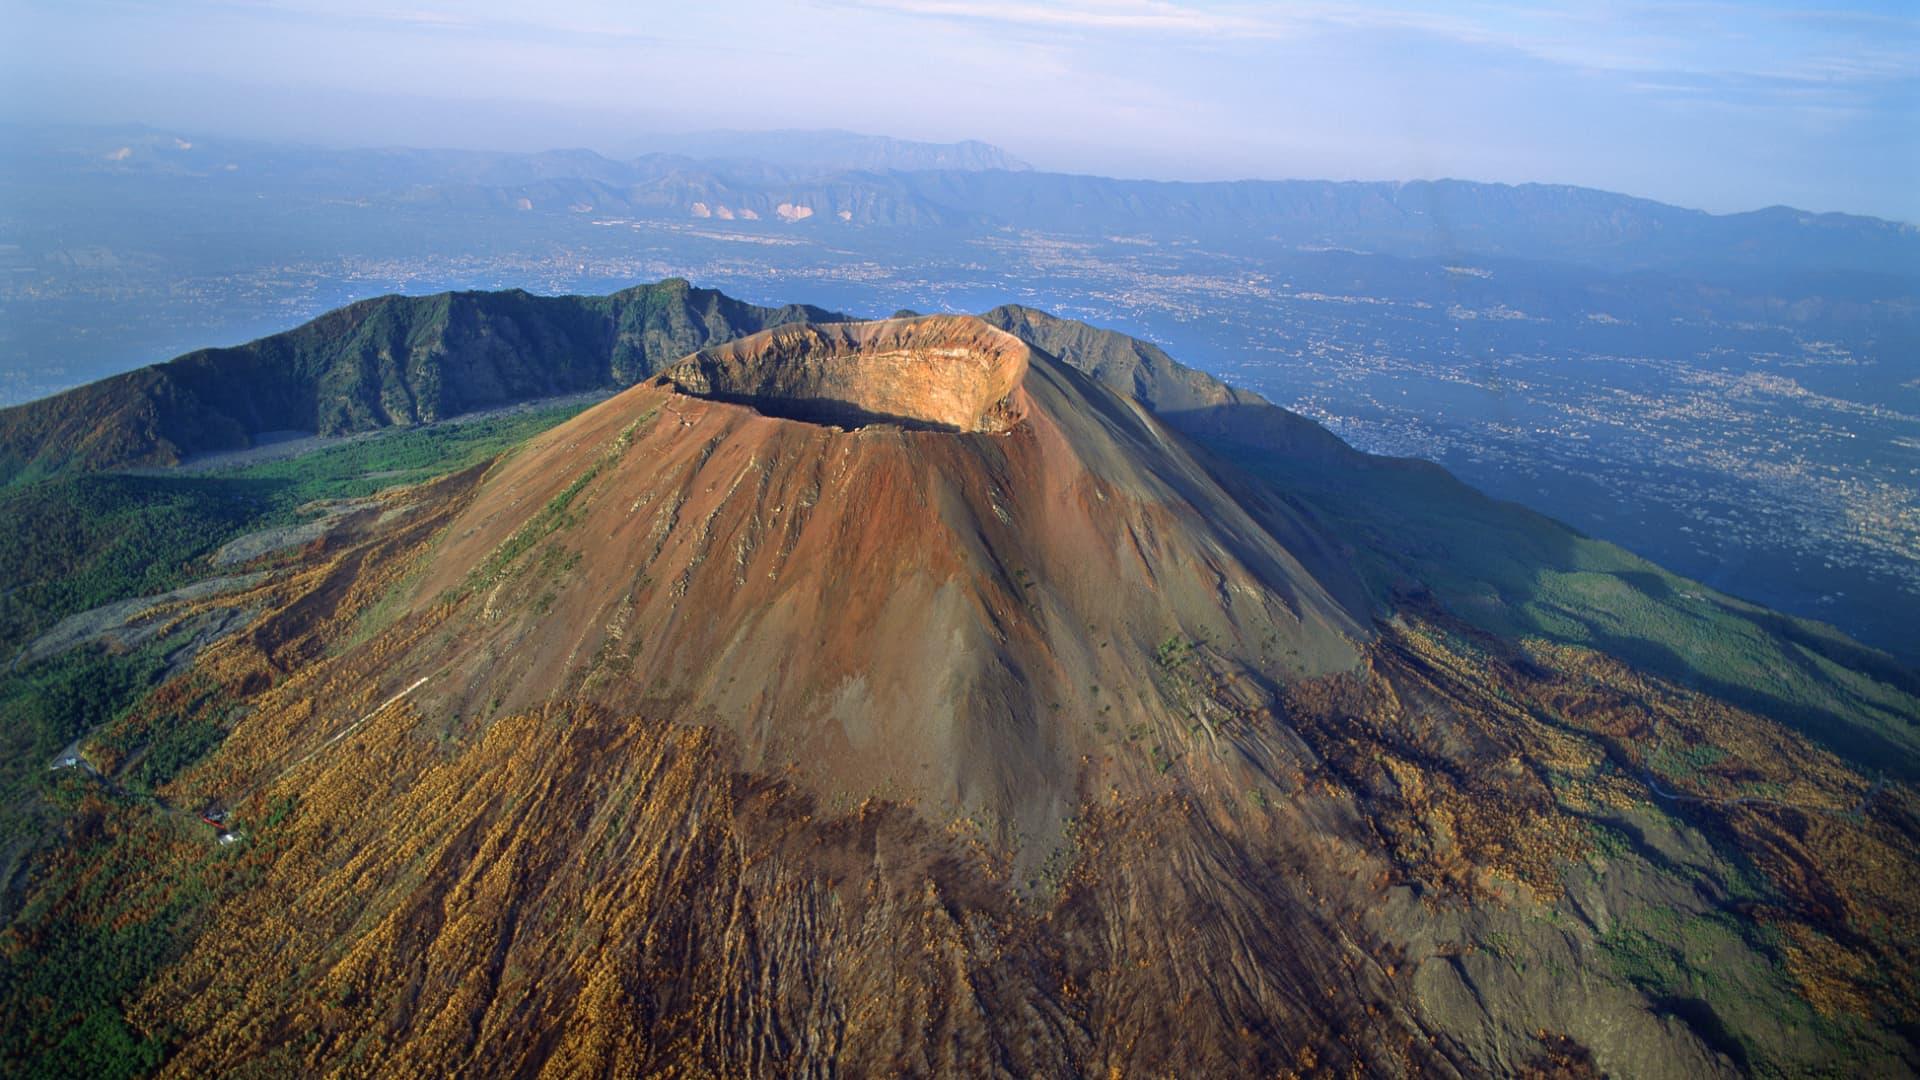 The summit caldera of Mount Vesuvius, near the Bay of Naples.